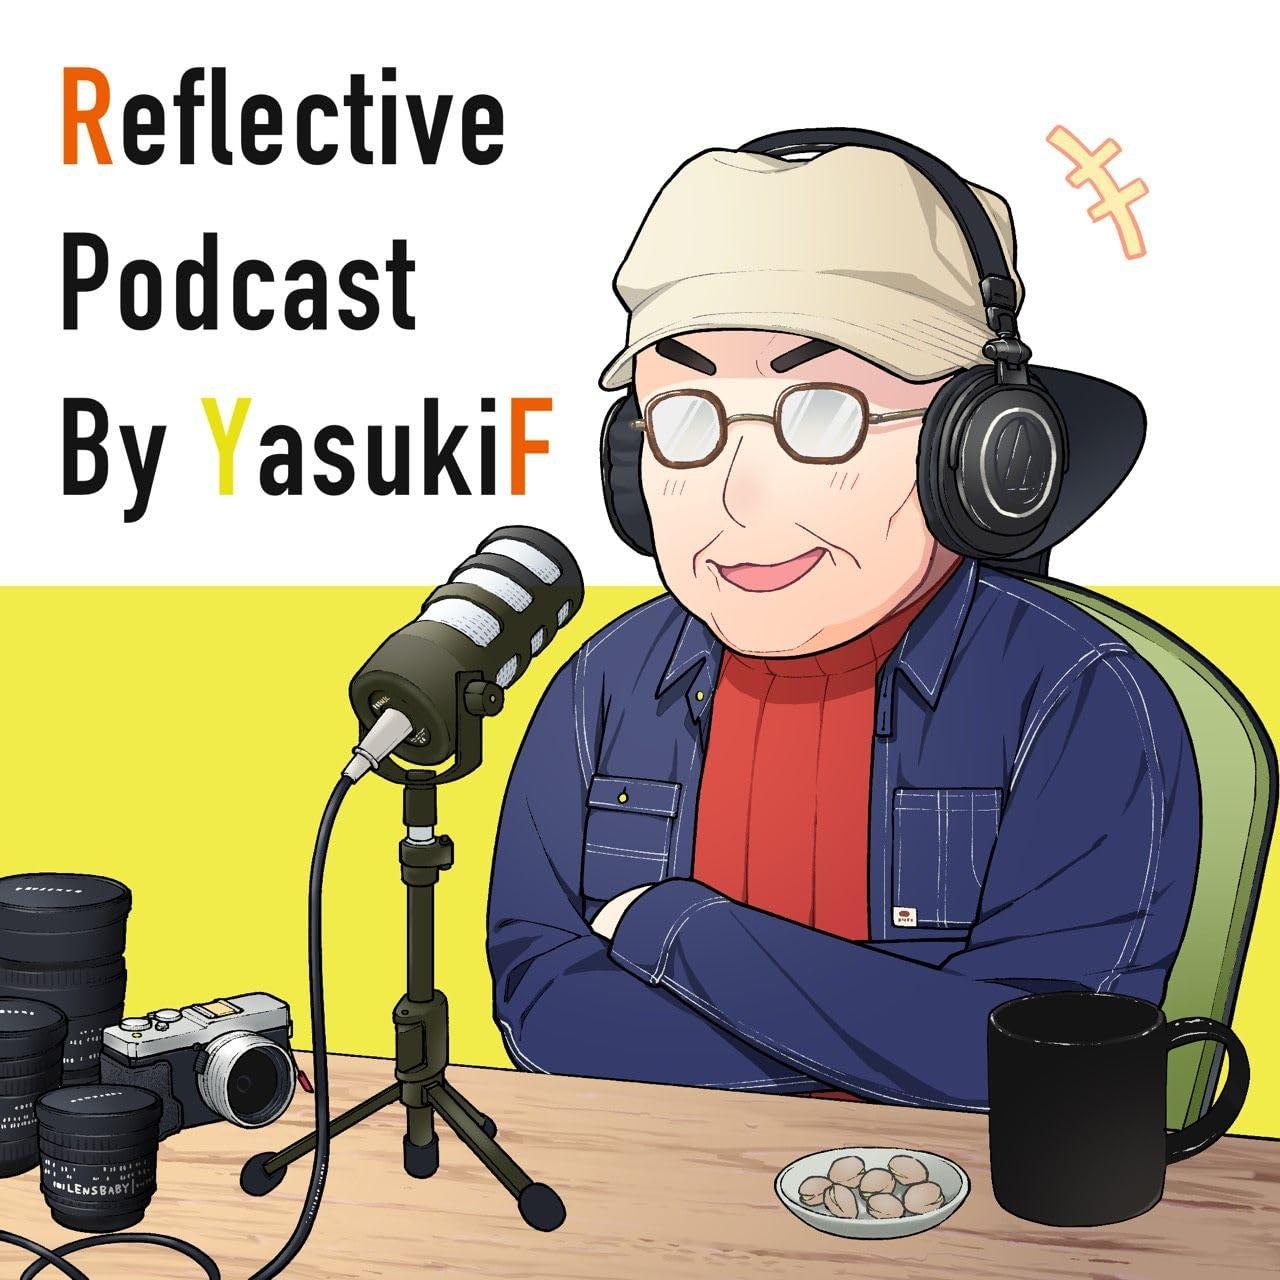 Reflective Podcast by YasukiF